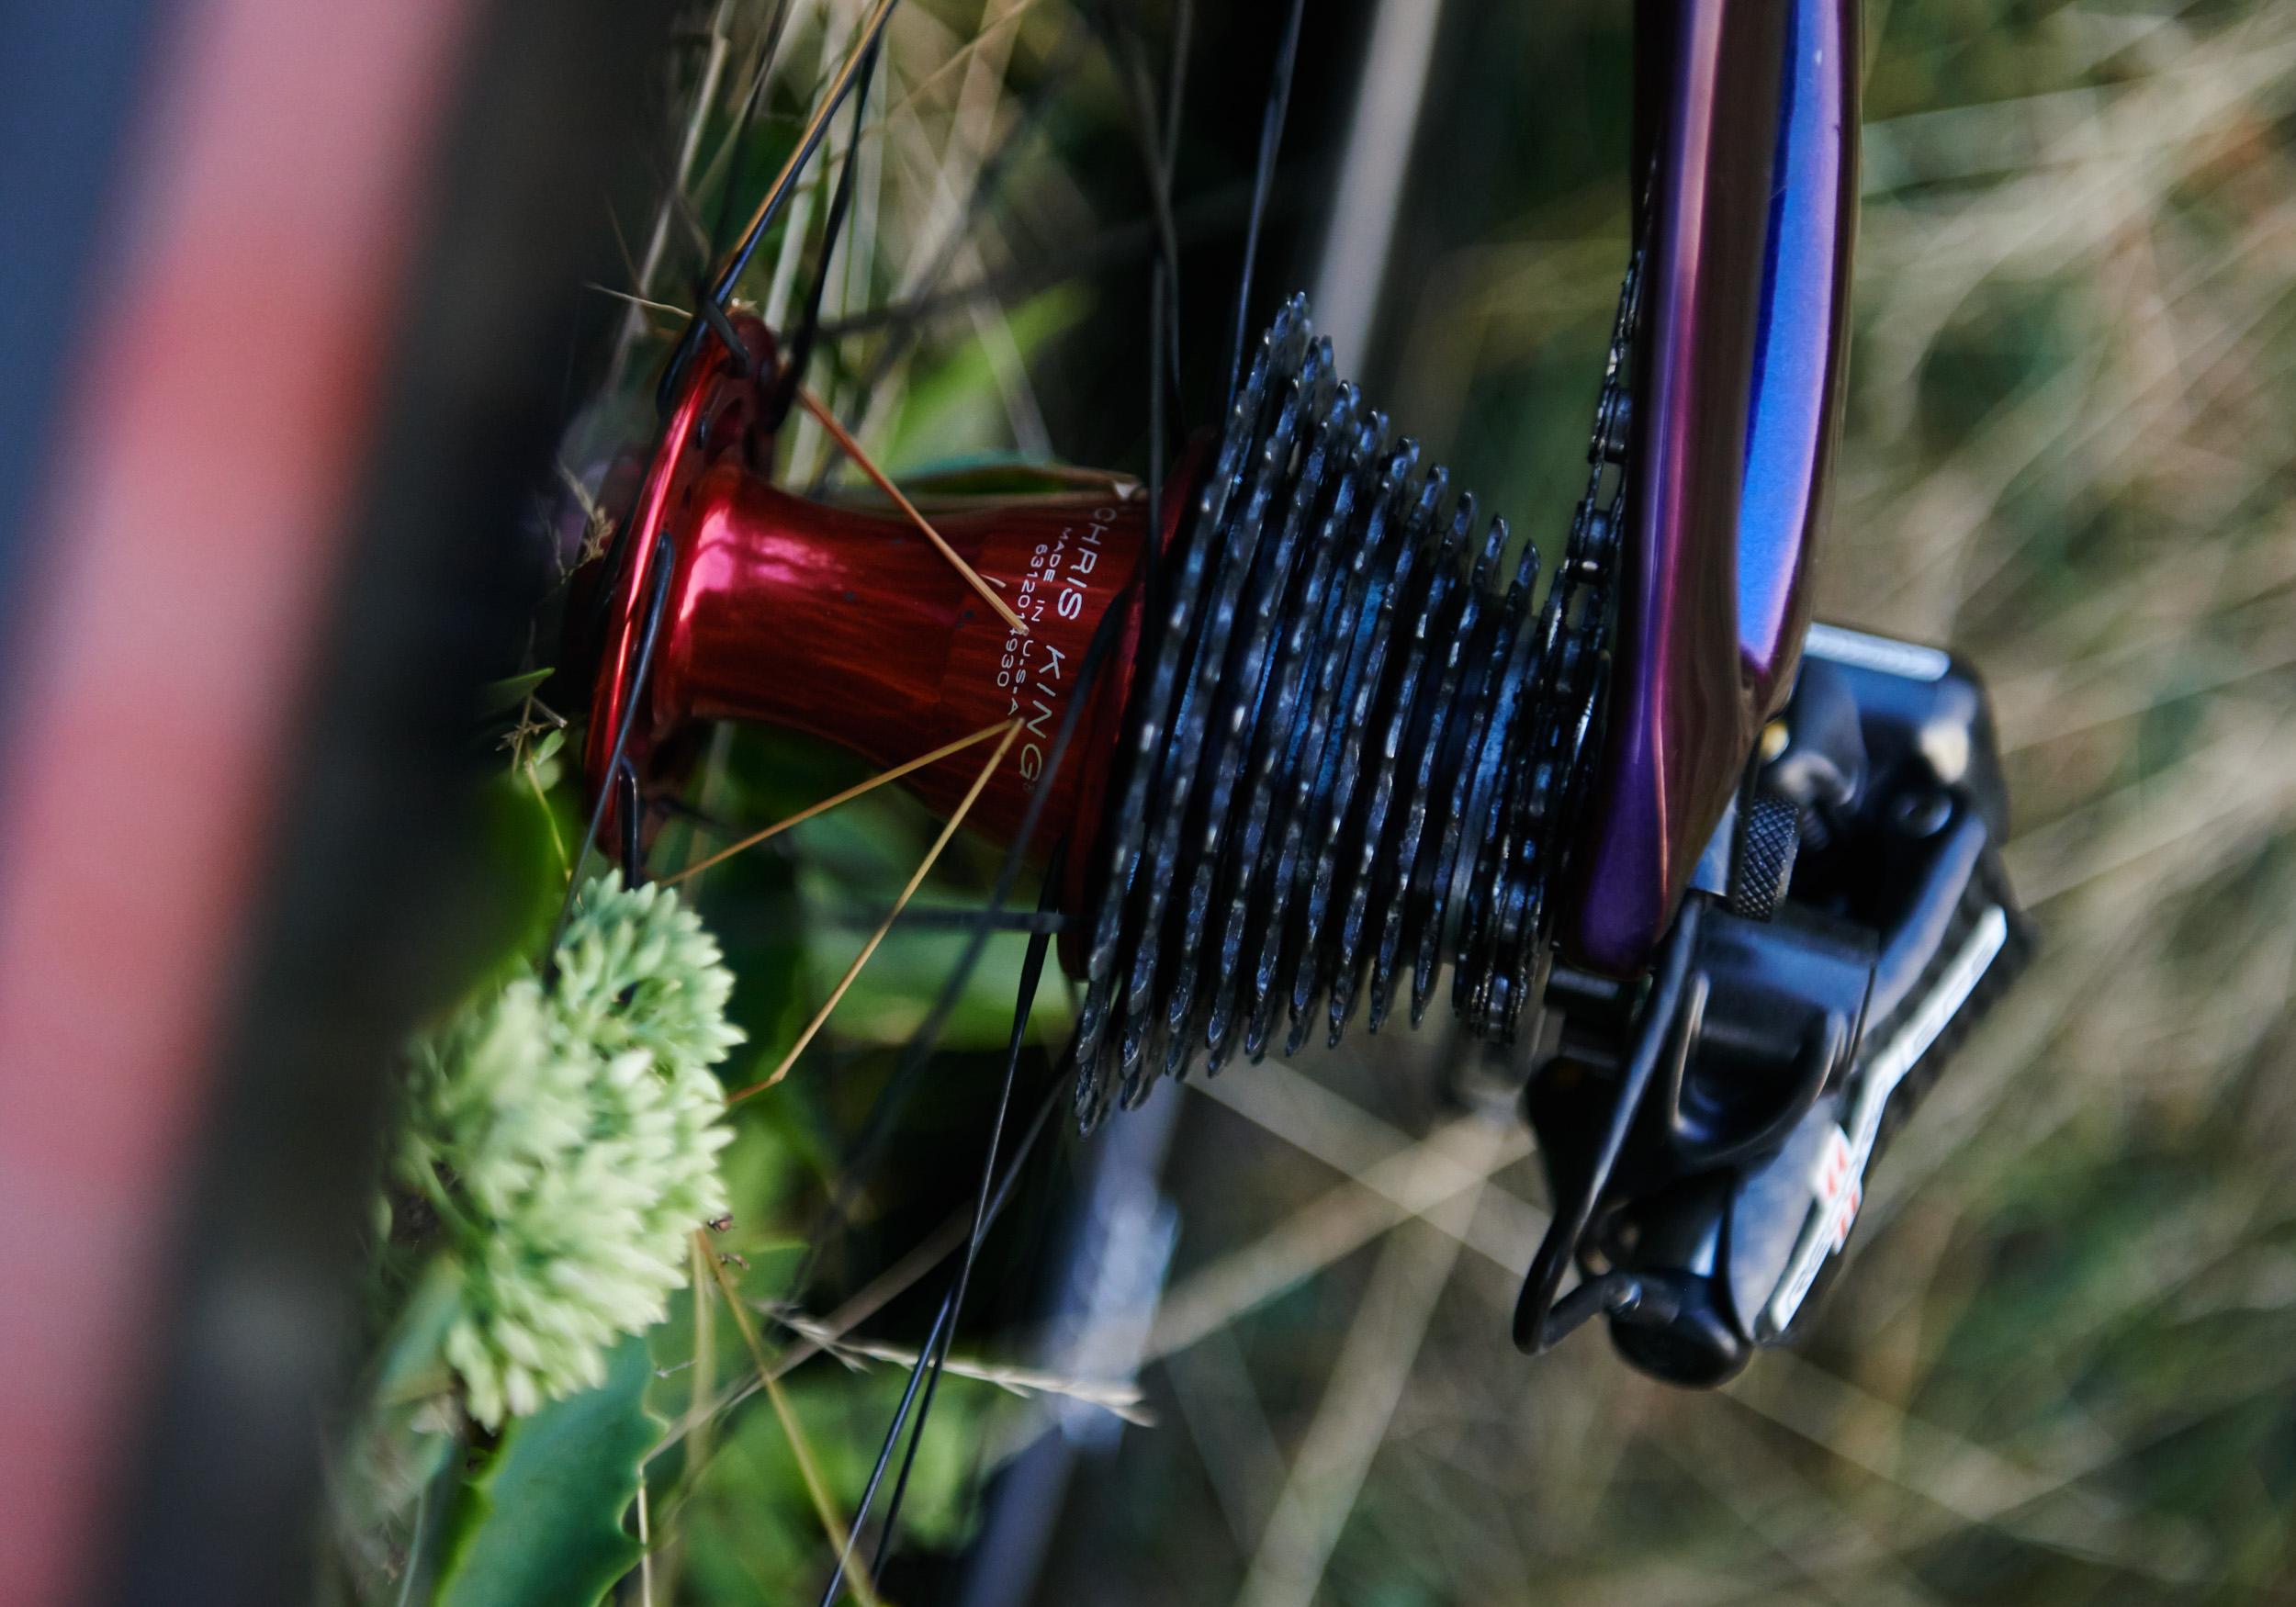 to-be-determined-garneau-a1-bike-review-106.jpg